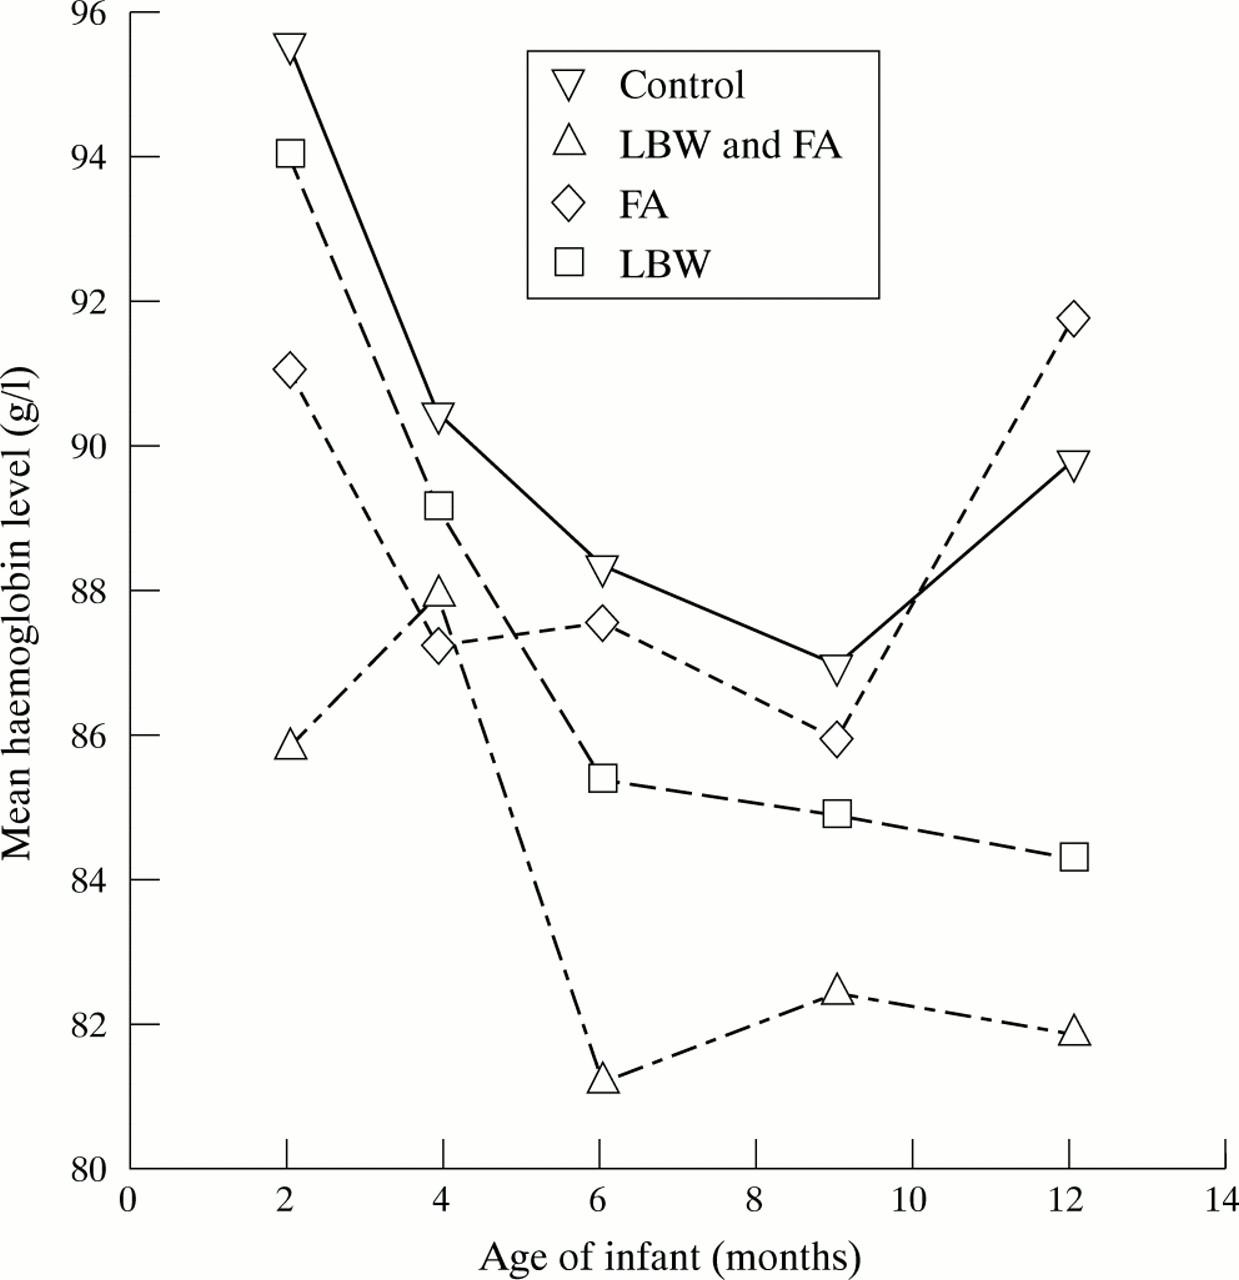 Changes in haemoglobin levels in infants in Malawi: effect